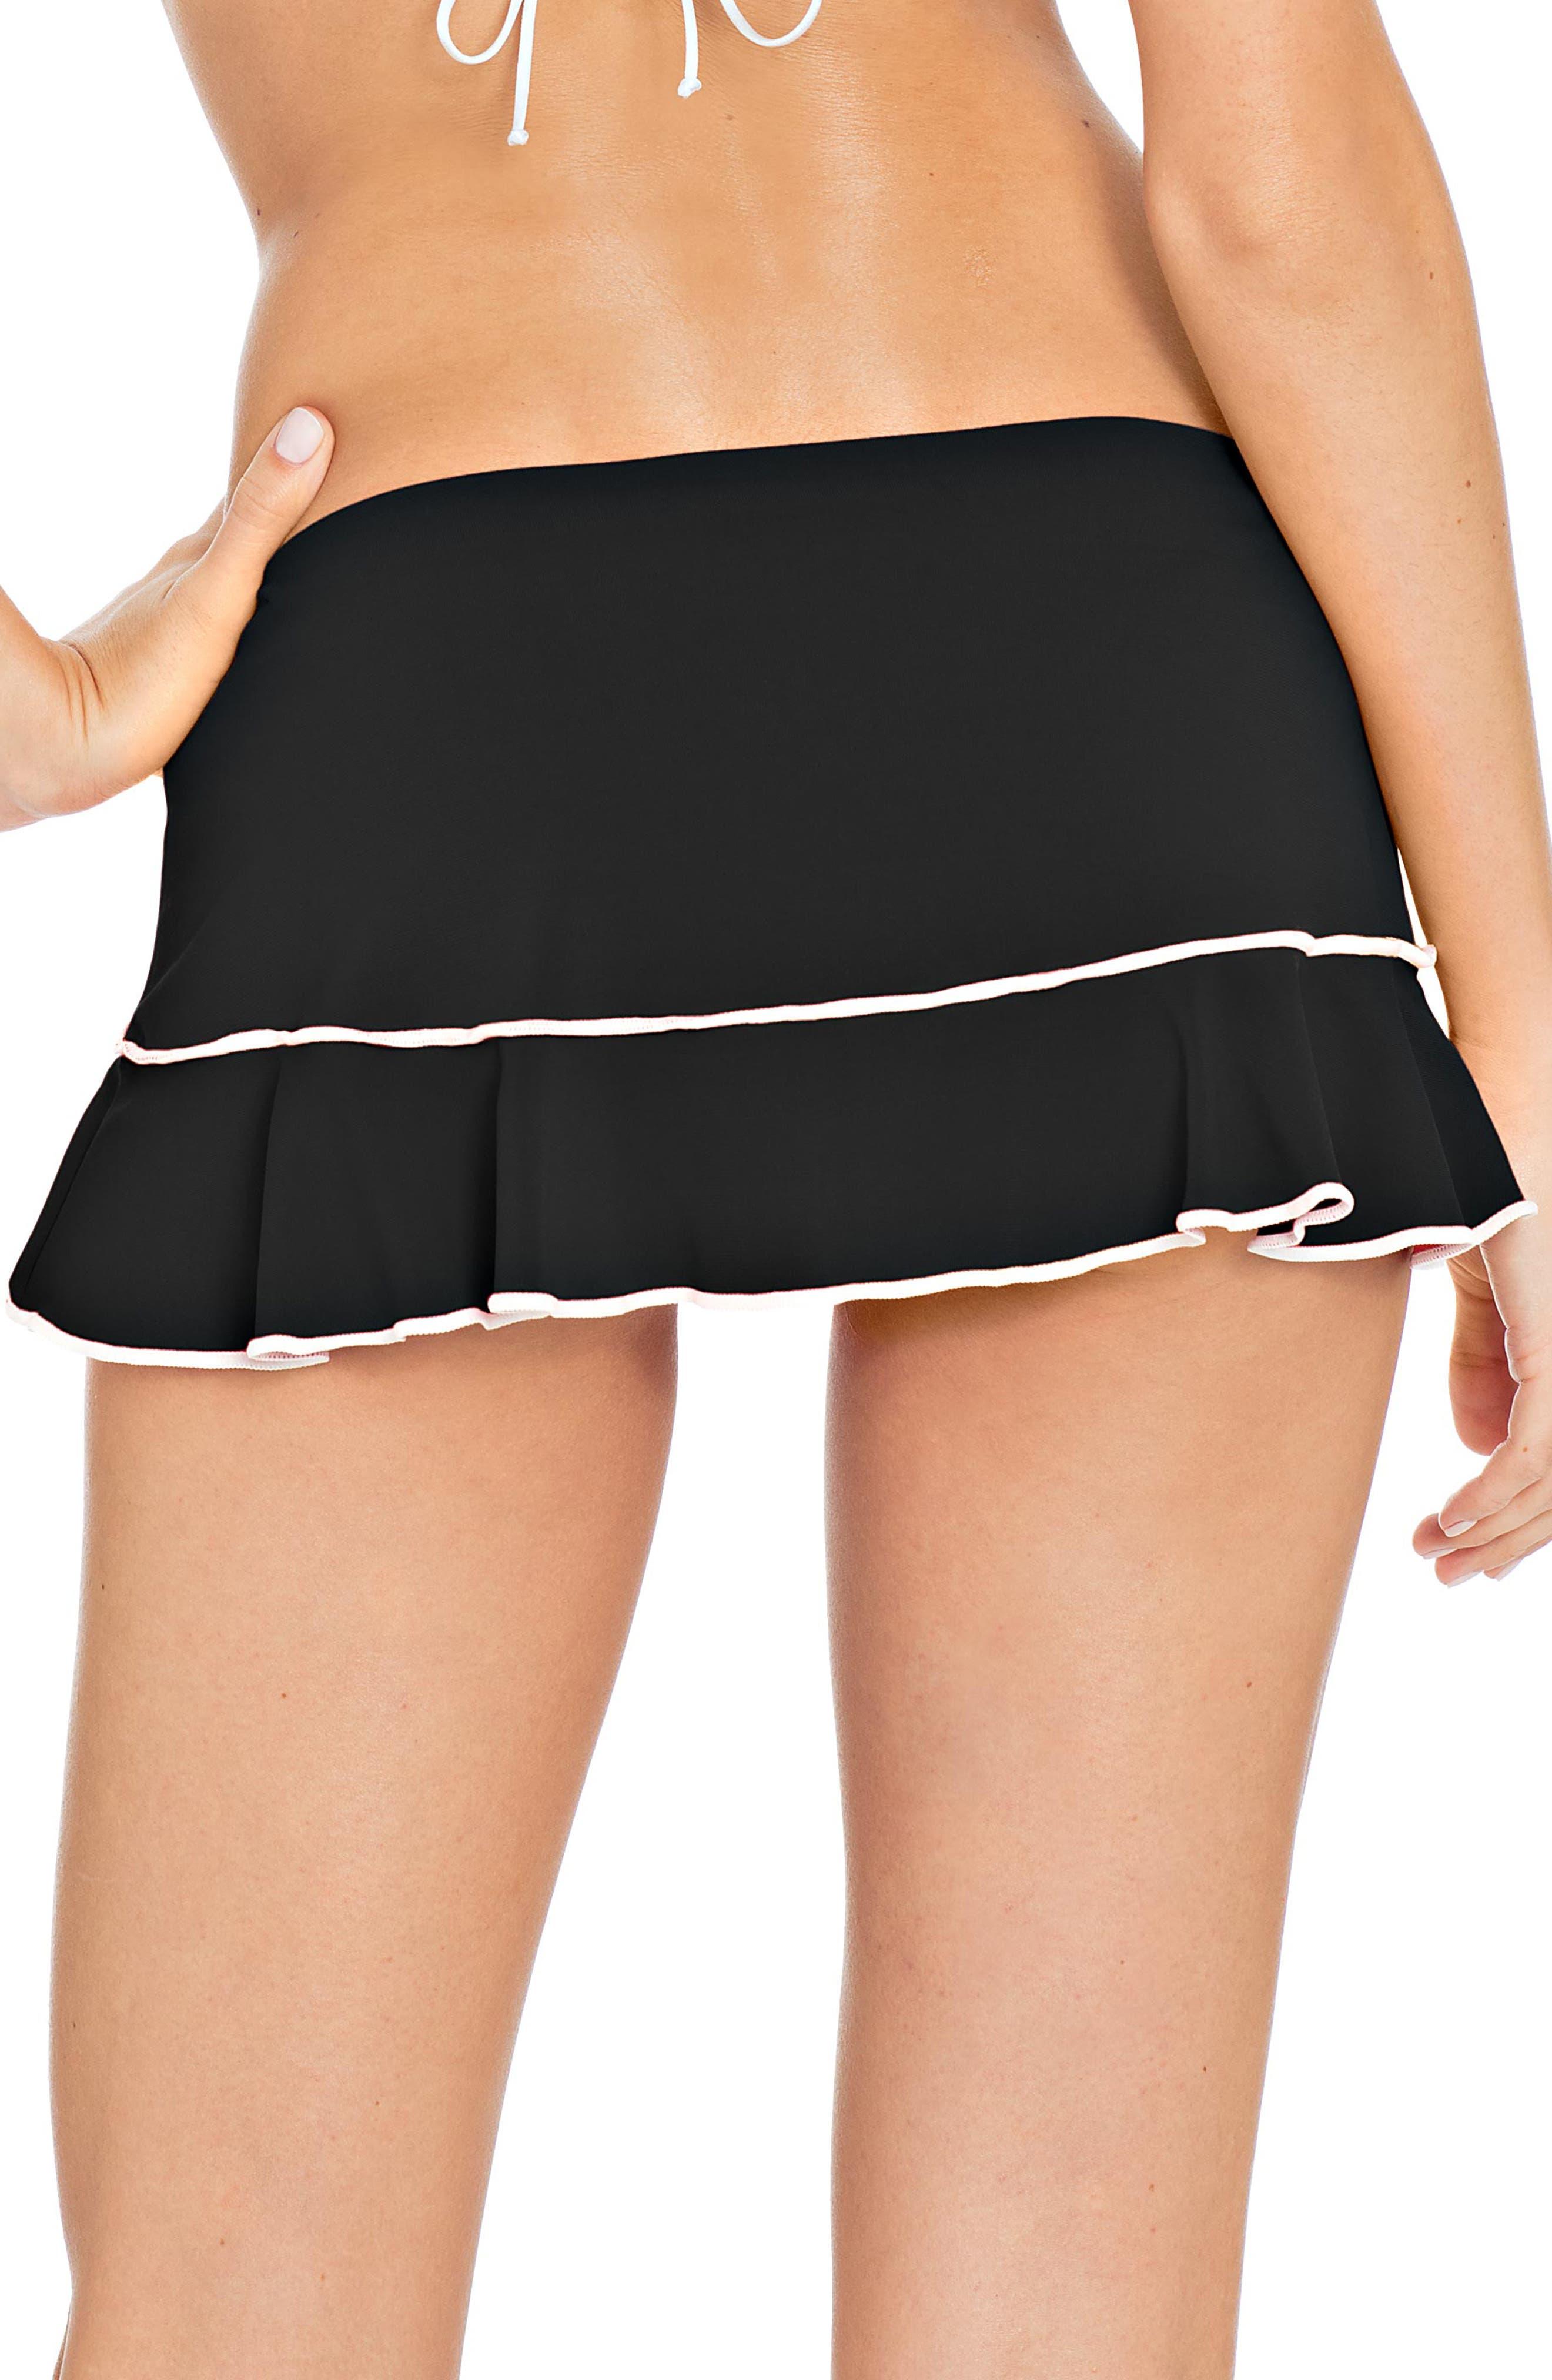 Malia Skirted Bikini Bottoms,                             Alternate thumbnail 2, color,                             BLACK/ WHITE